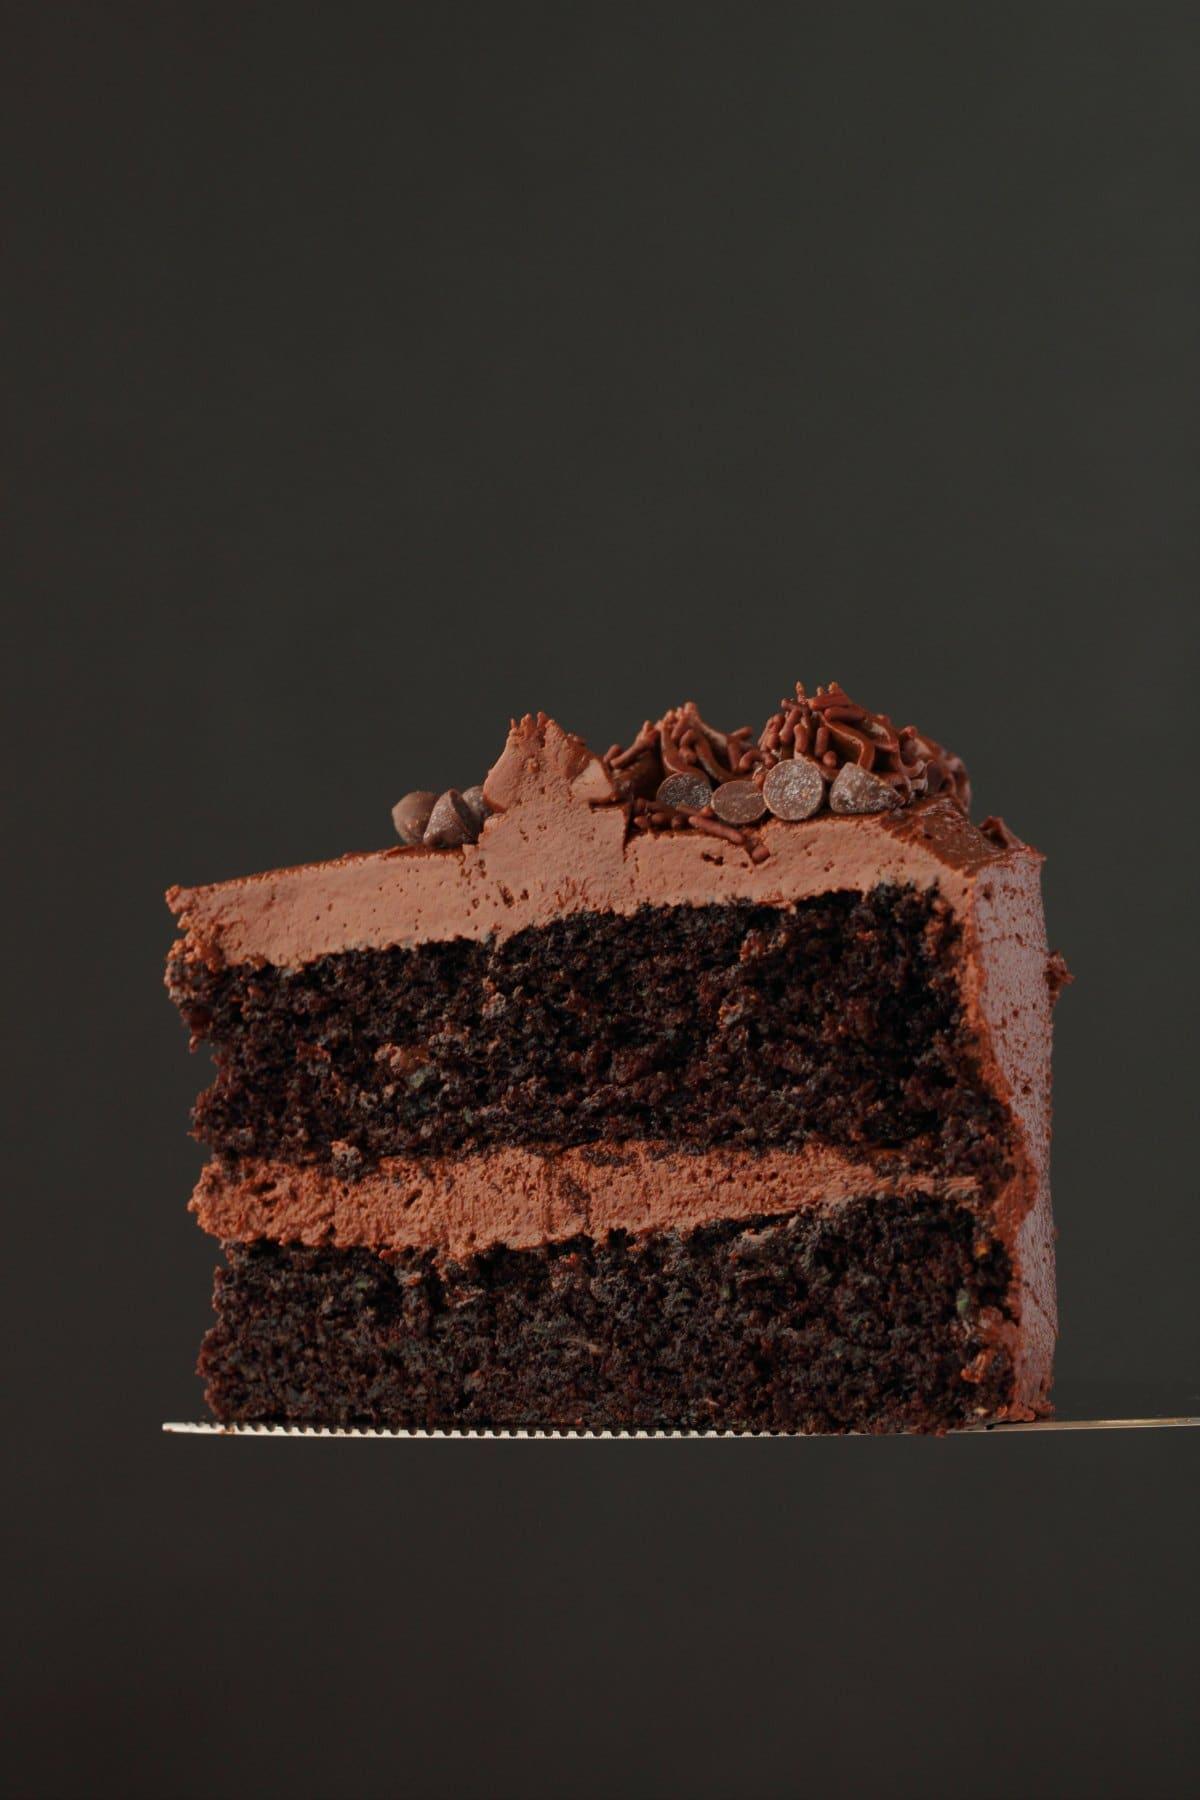 A slice of vegan chocolate zucchini cake on a cake slicer.